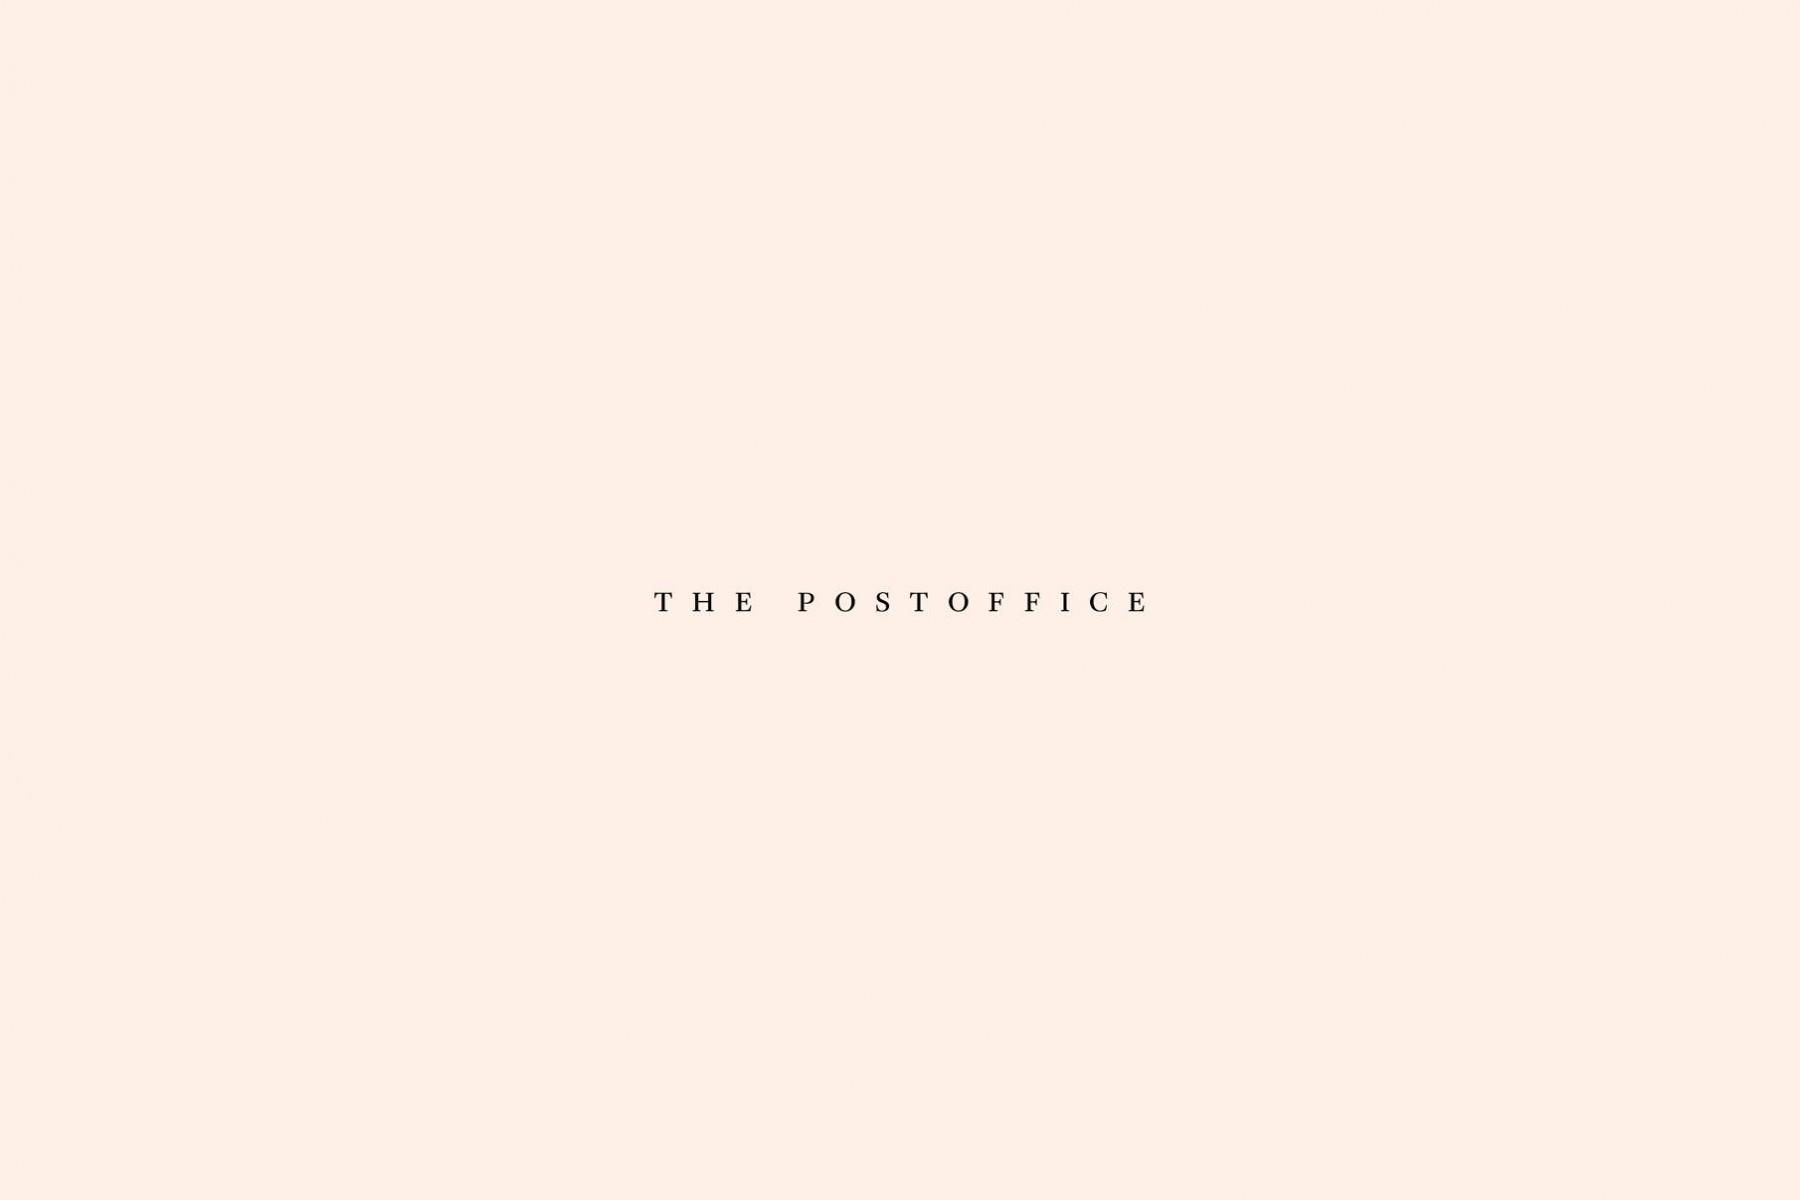 The Postoffice